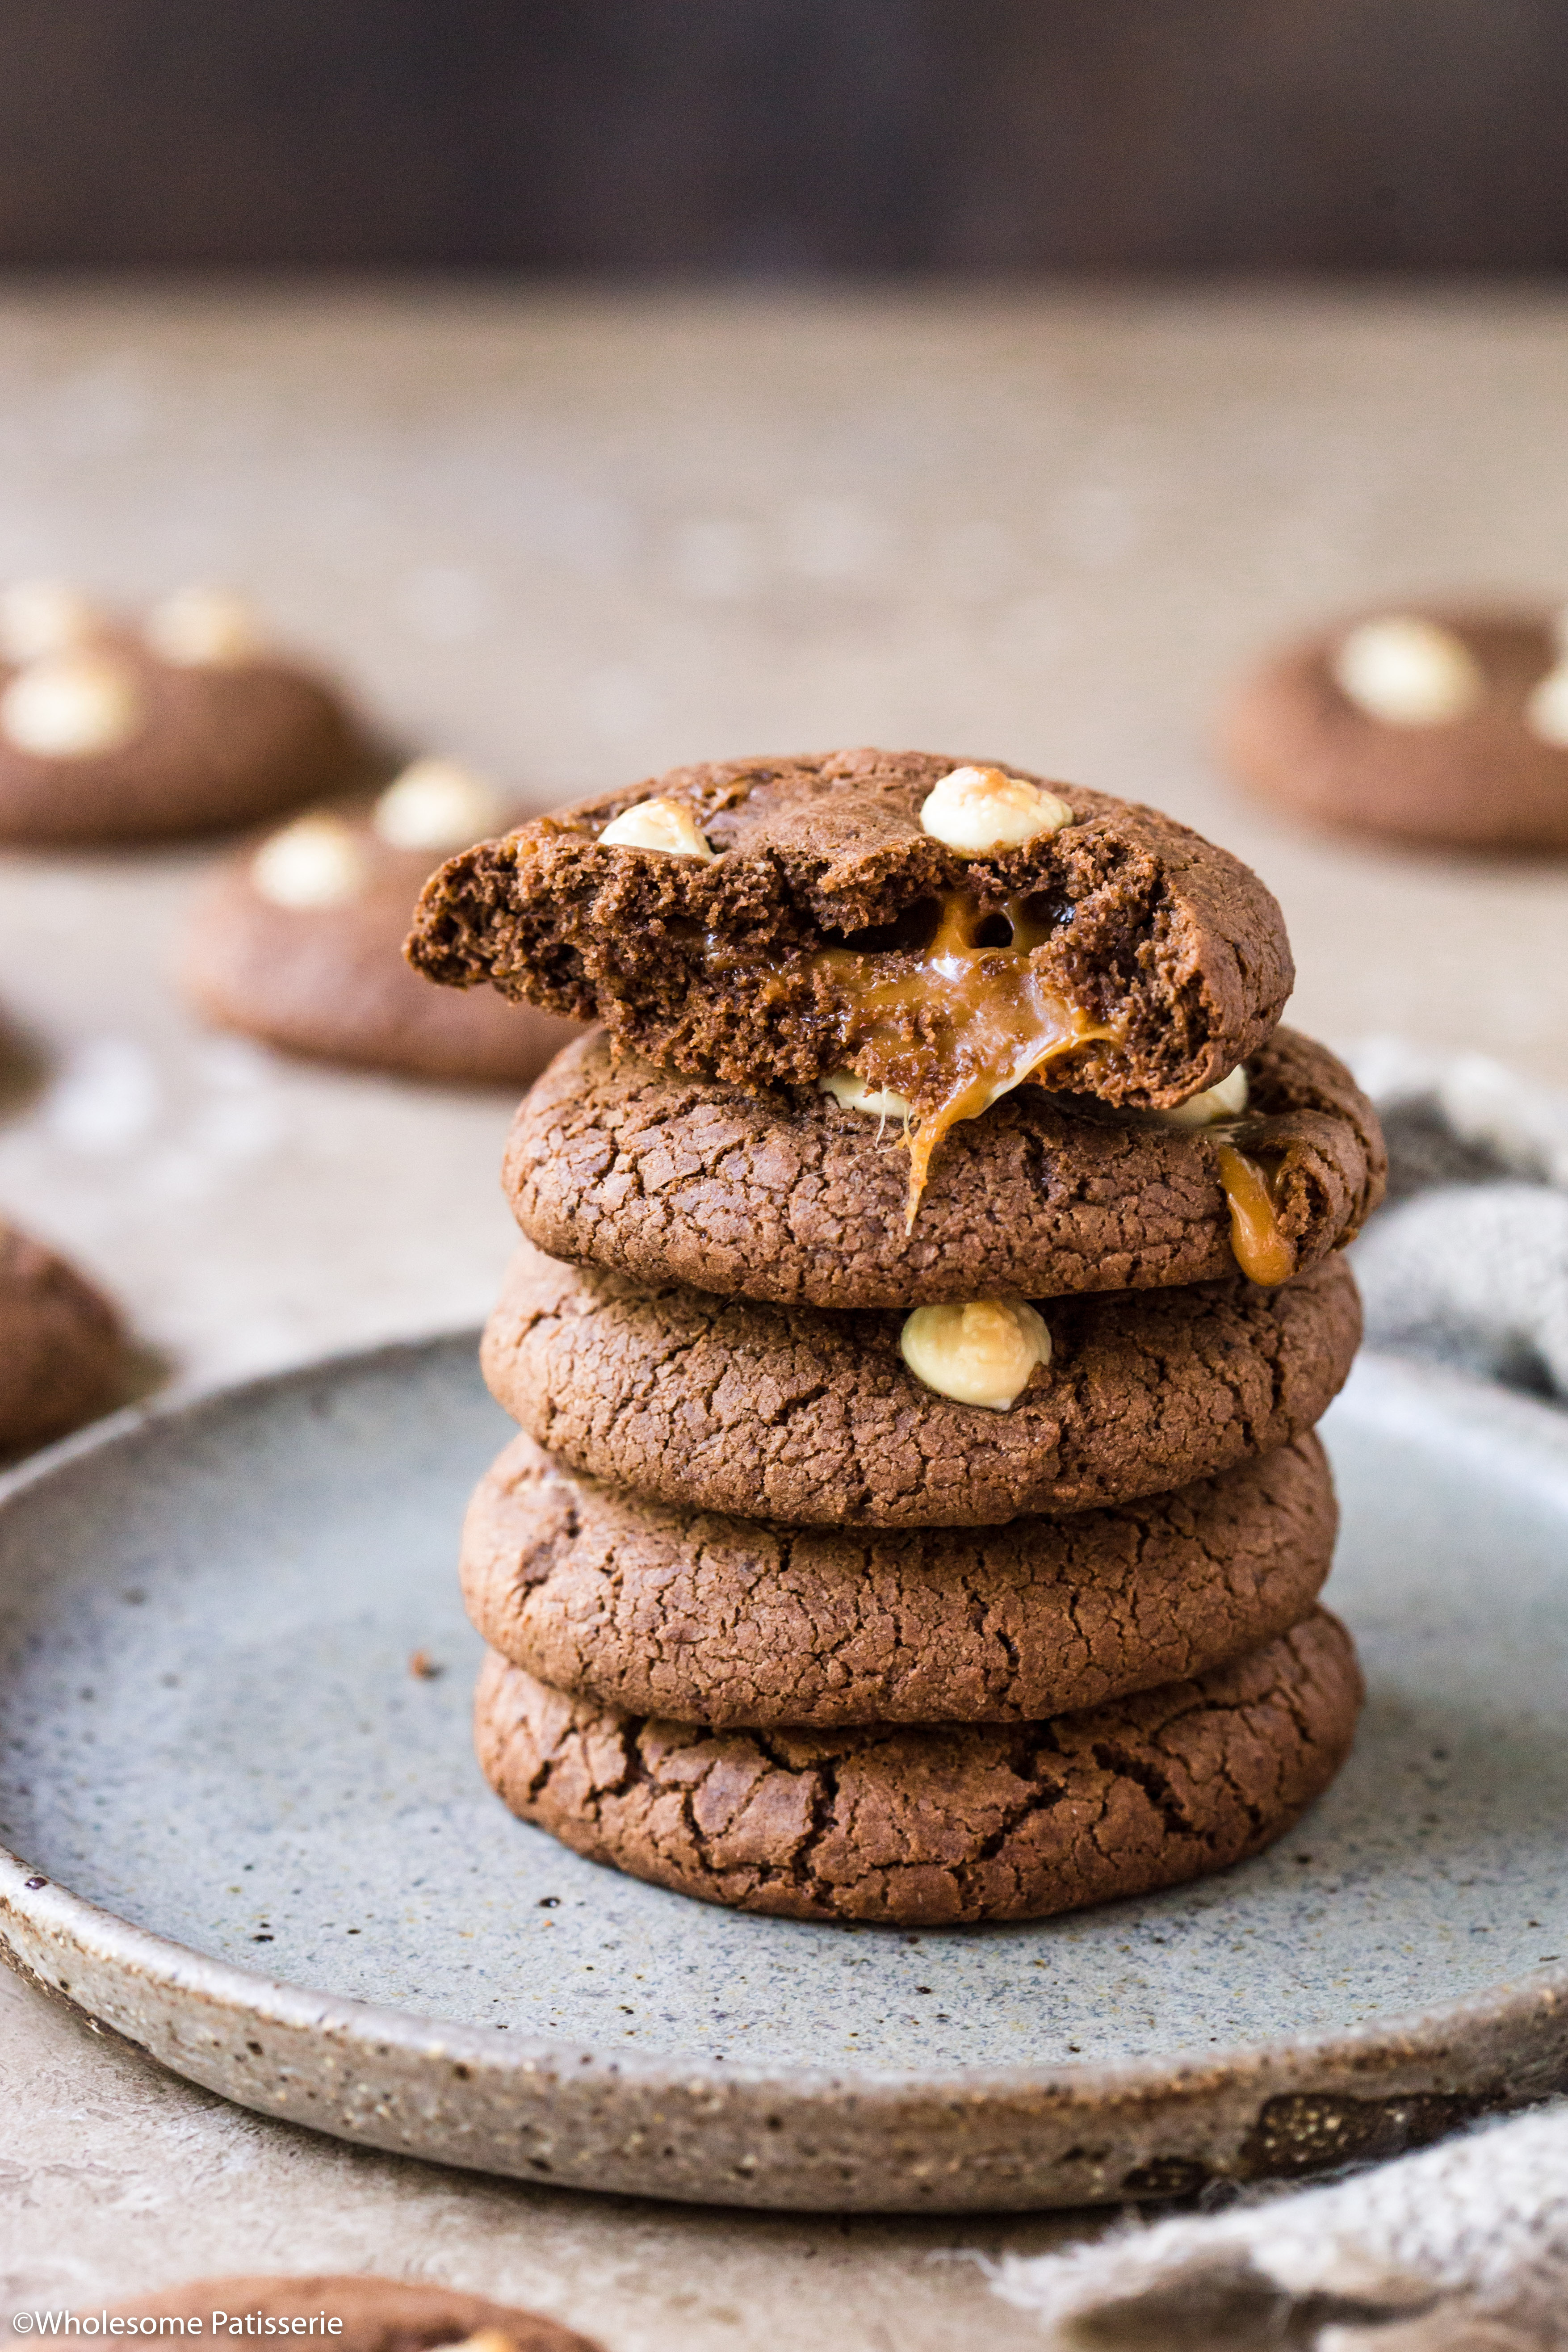 Double Chocolate Toffee Stuffed Cookies